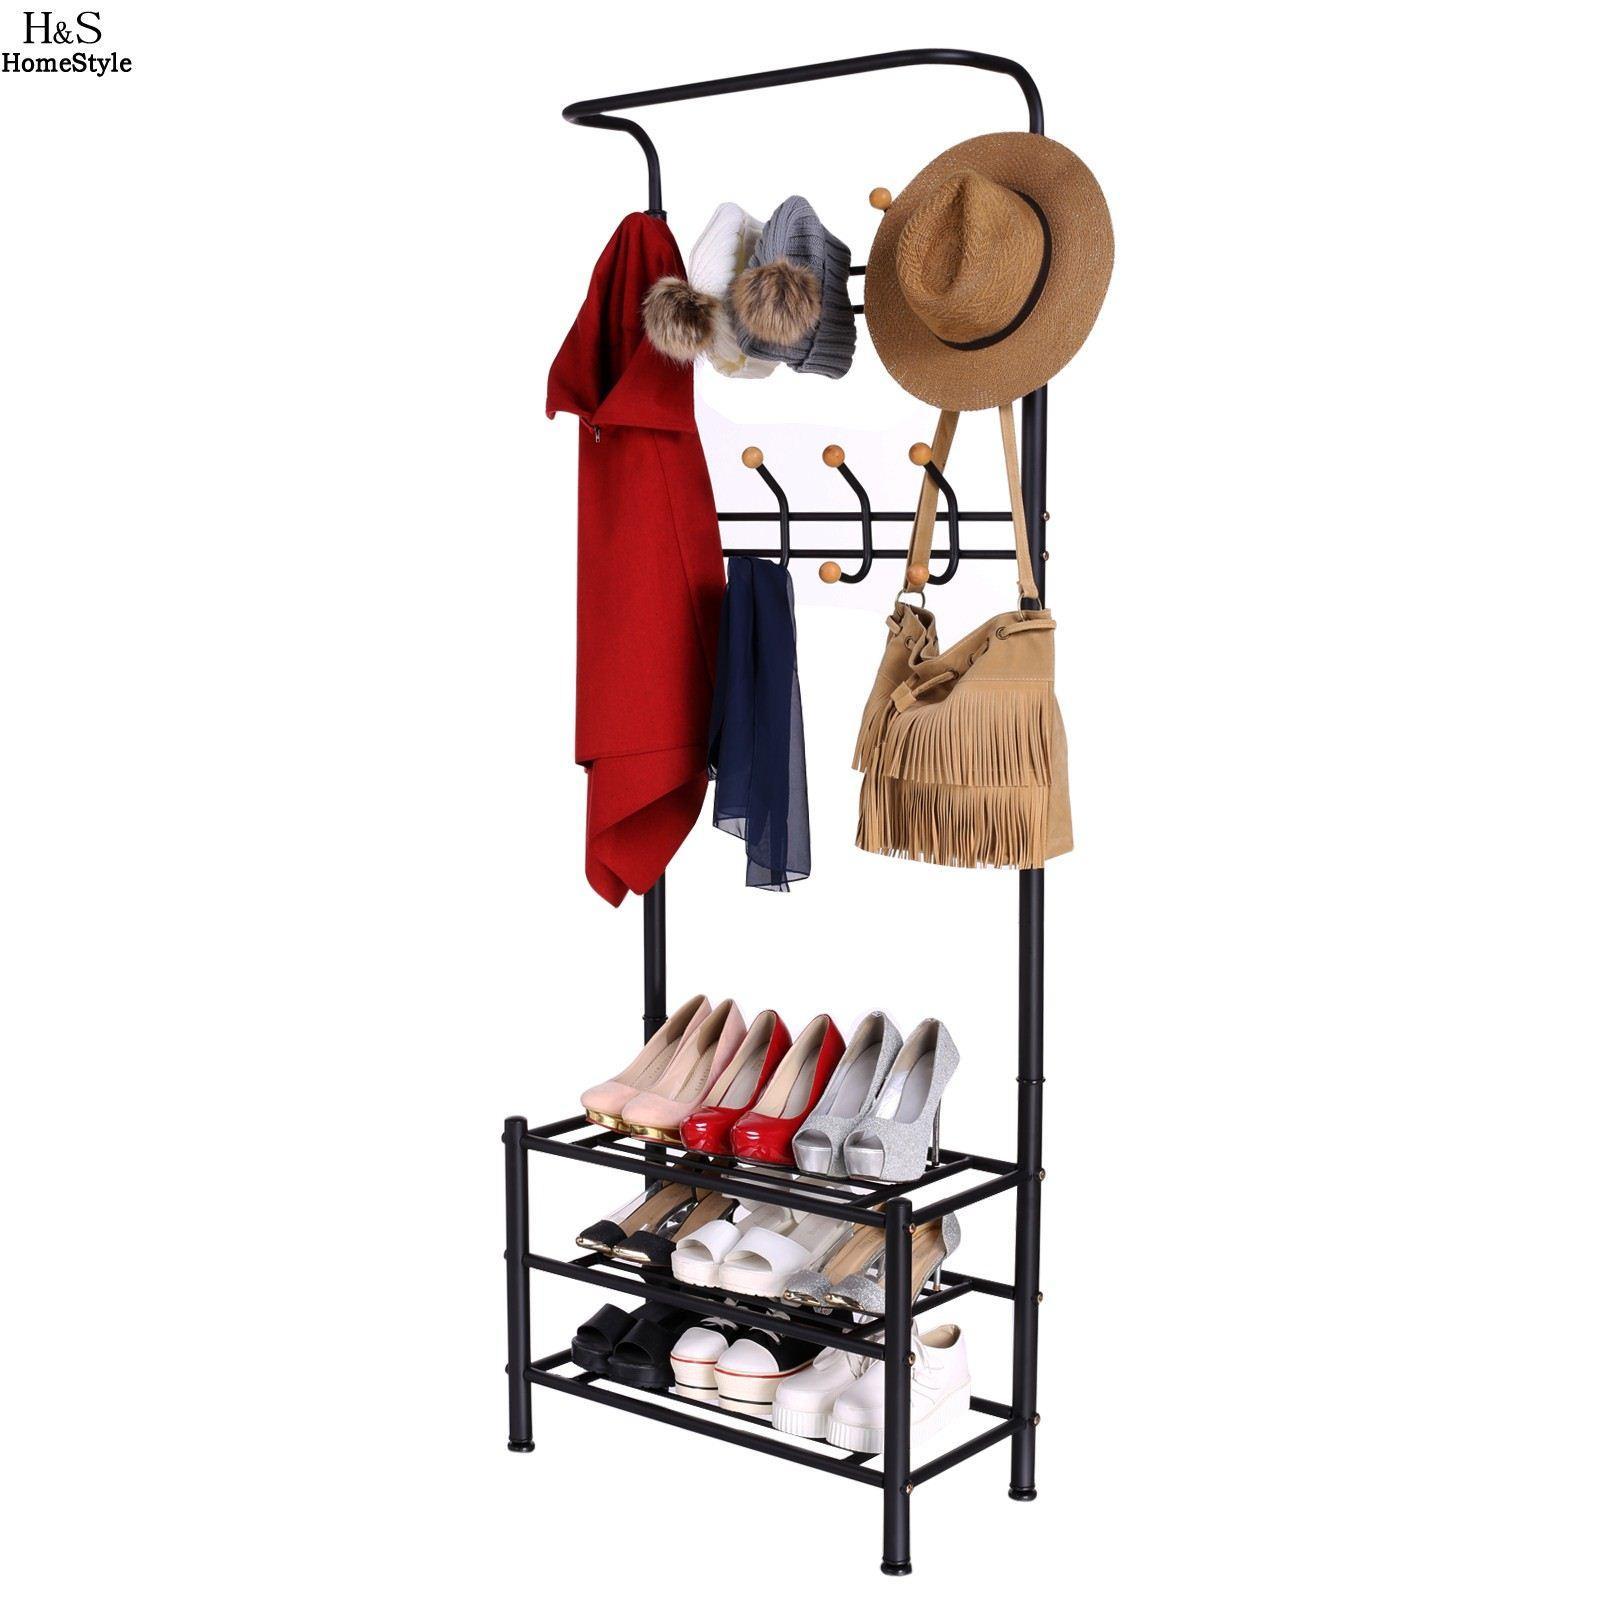 Shoe Rack Coat Hanger.2019 Homdox 3 Tiers Garment Hat Coat Hanger Metal Clothes Rack Shoe Shelf Organizer Us Store From Tanzhilian 79 51 Dhgate Com